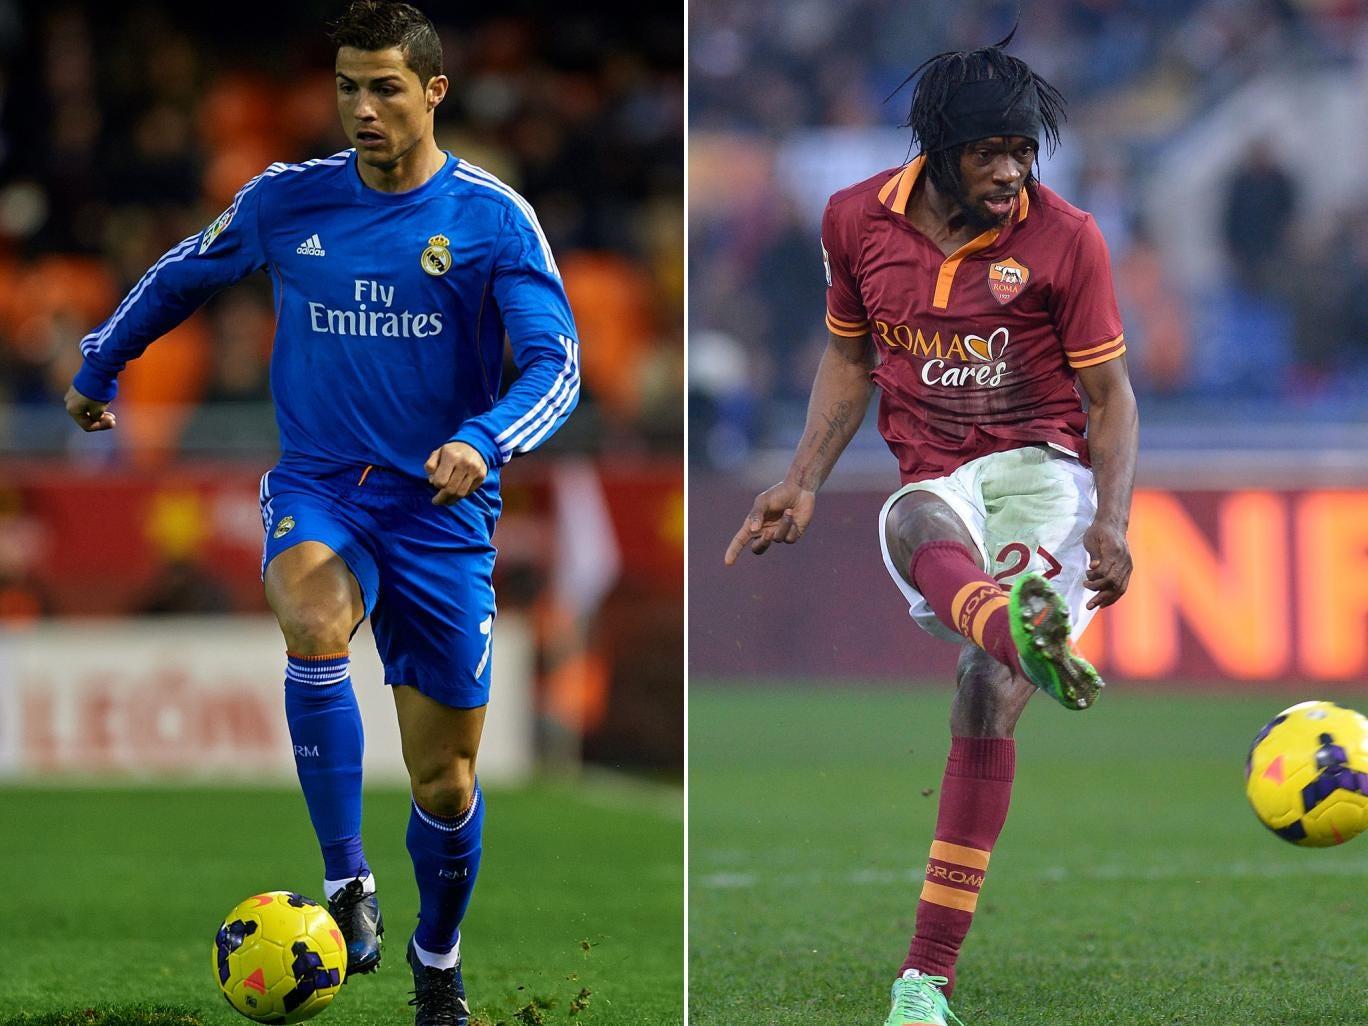 Real Madrid's Cristiano Ronaldo (left) and Gervinho of Roma